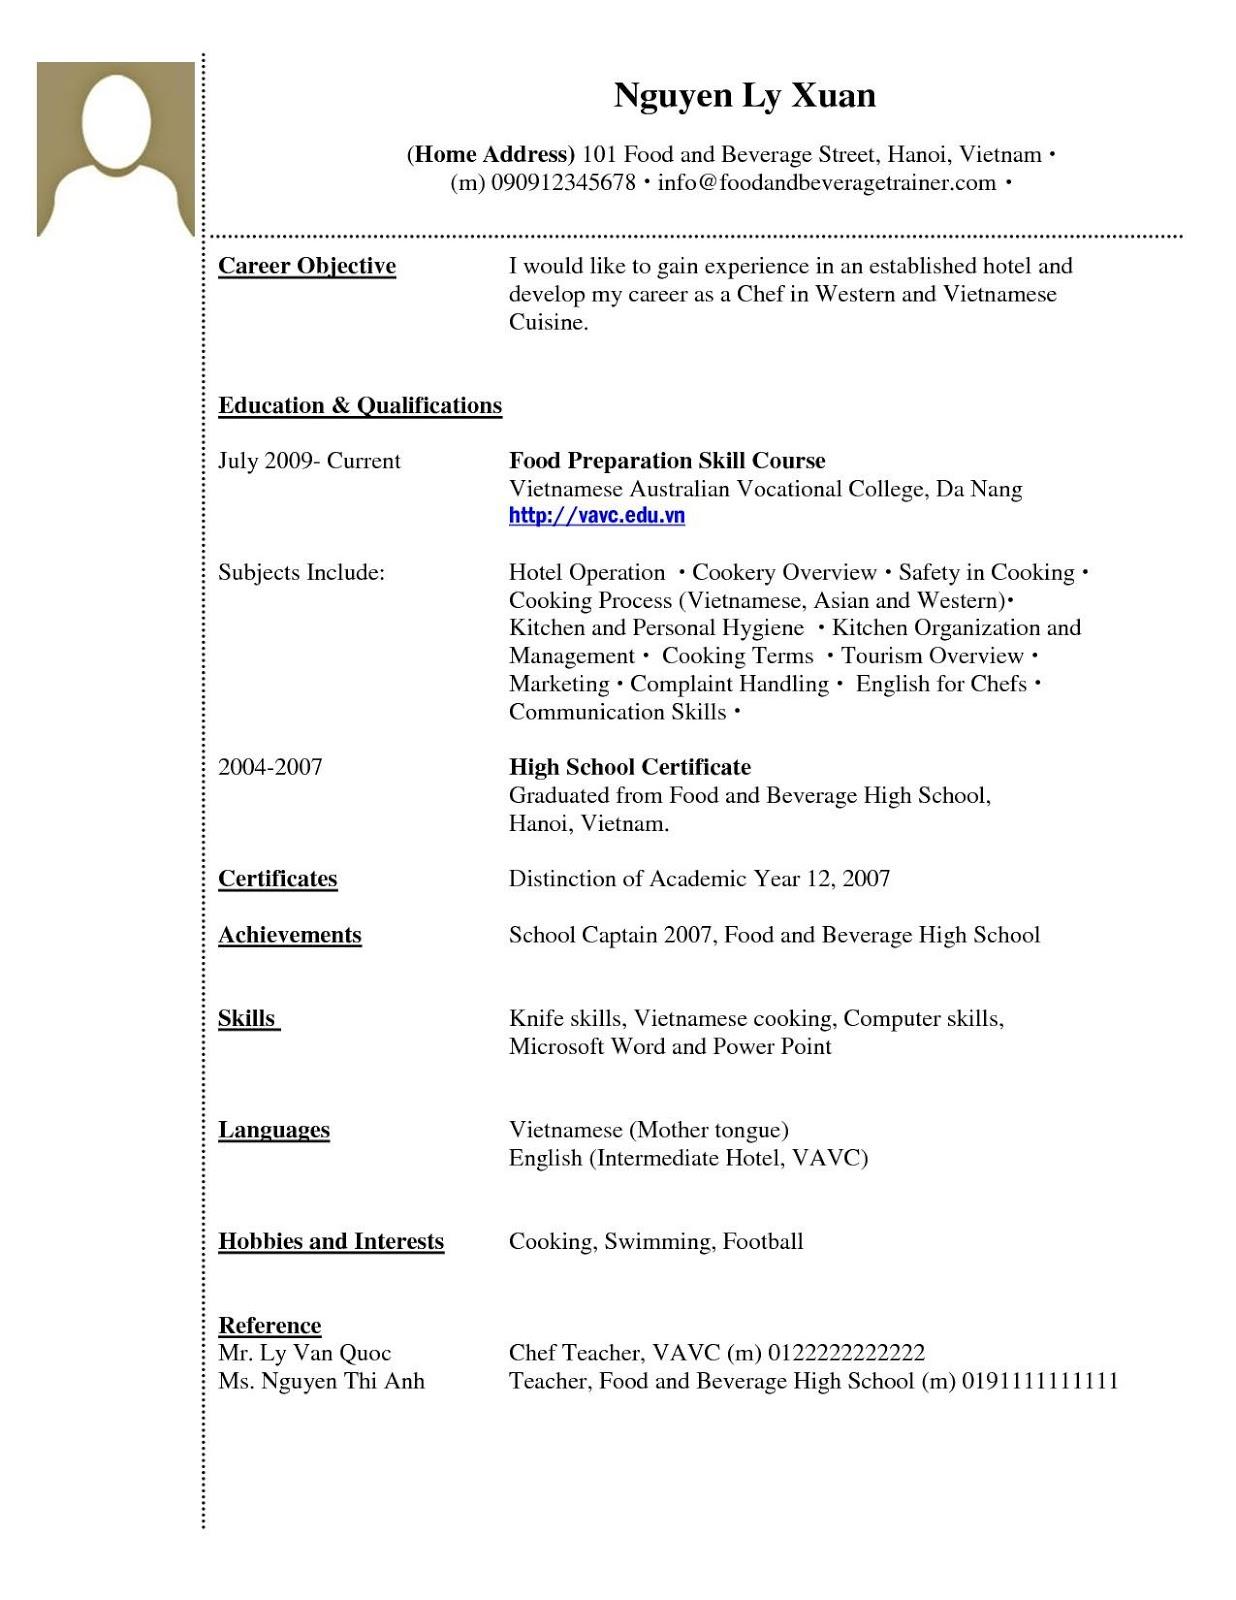 waiter resume sample, waiter resume sample pdf 2019, waiter resume sample no experience, waiter resume sample free download 2020, waiter resume sample australia, waiter resume sample with experience, waiter cv sample, waiter cv sample pdf, waiter cv samples, waiter cv sample uk, waiter resume examples, hotel waiter resume sample, waiter sample resume objective,